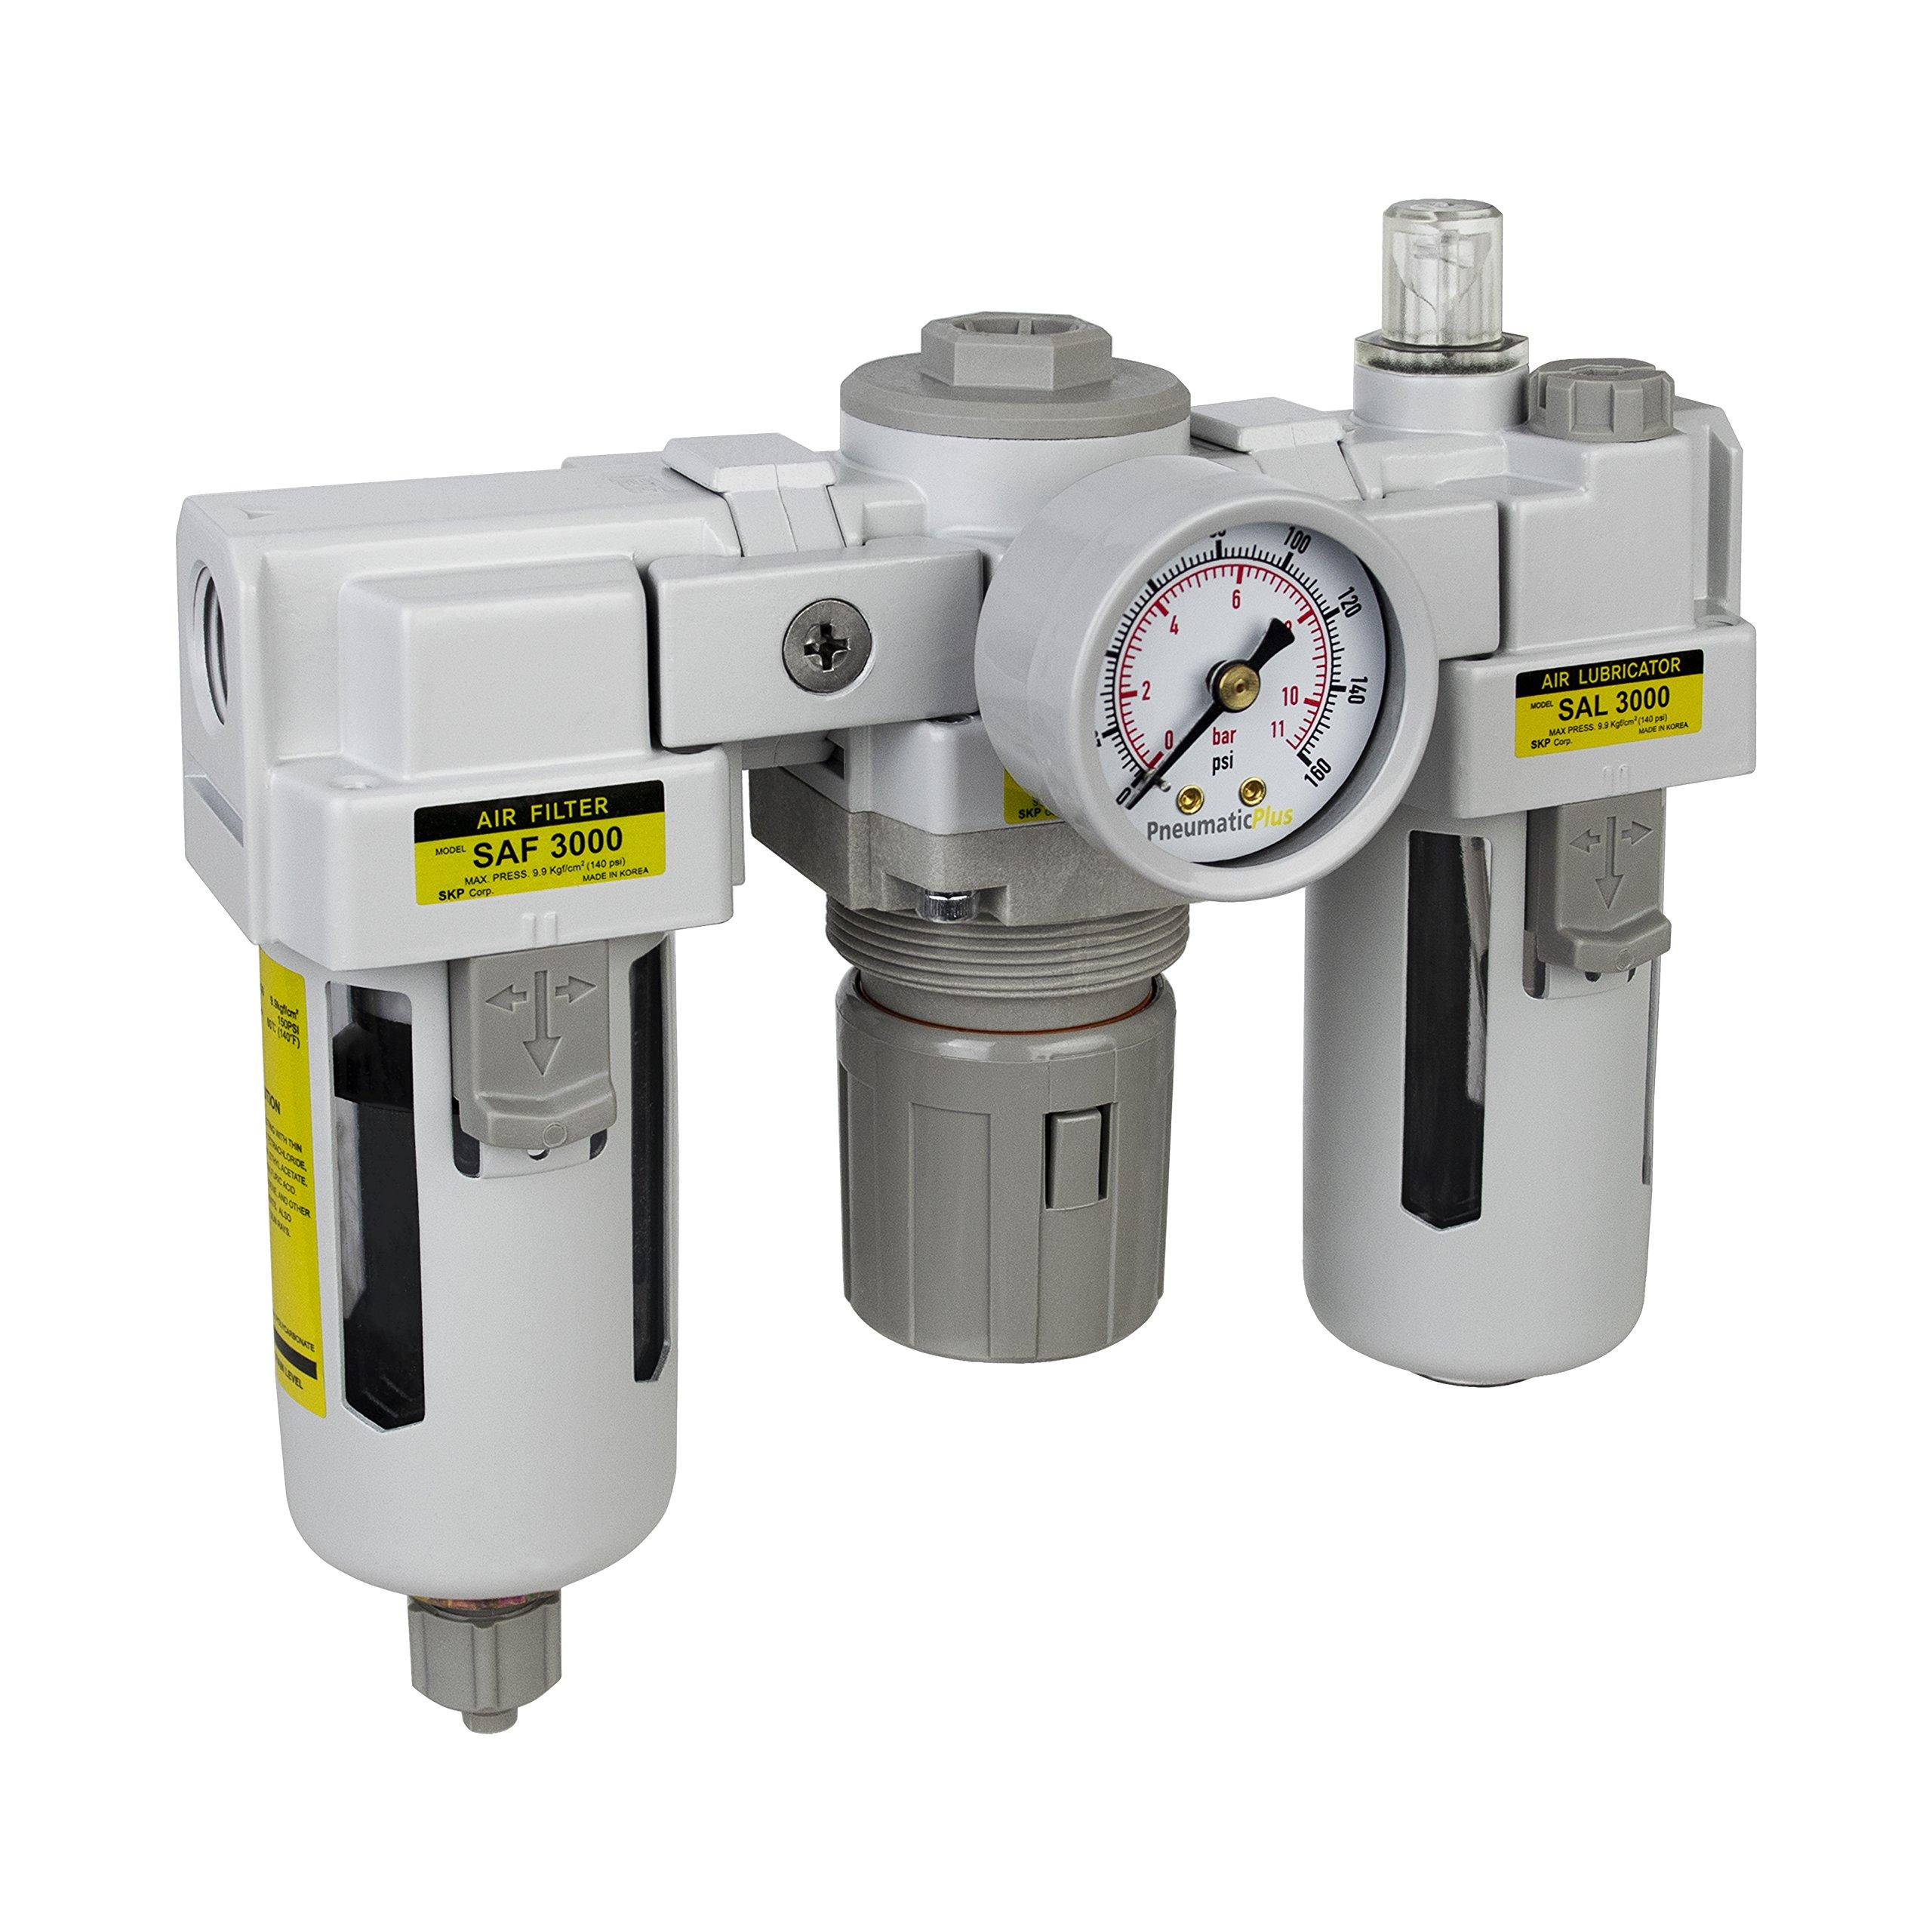 PneumaticPlus SAU3000M-N03G 3 Unit Combo Compressed Air Filter Regulator Lubricator, 3/8'' Pipe Size, NPT-Manual Drain, Poly Bowl, 10 μm with Gauge by PneumaticPlus